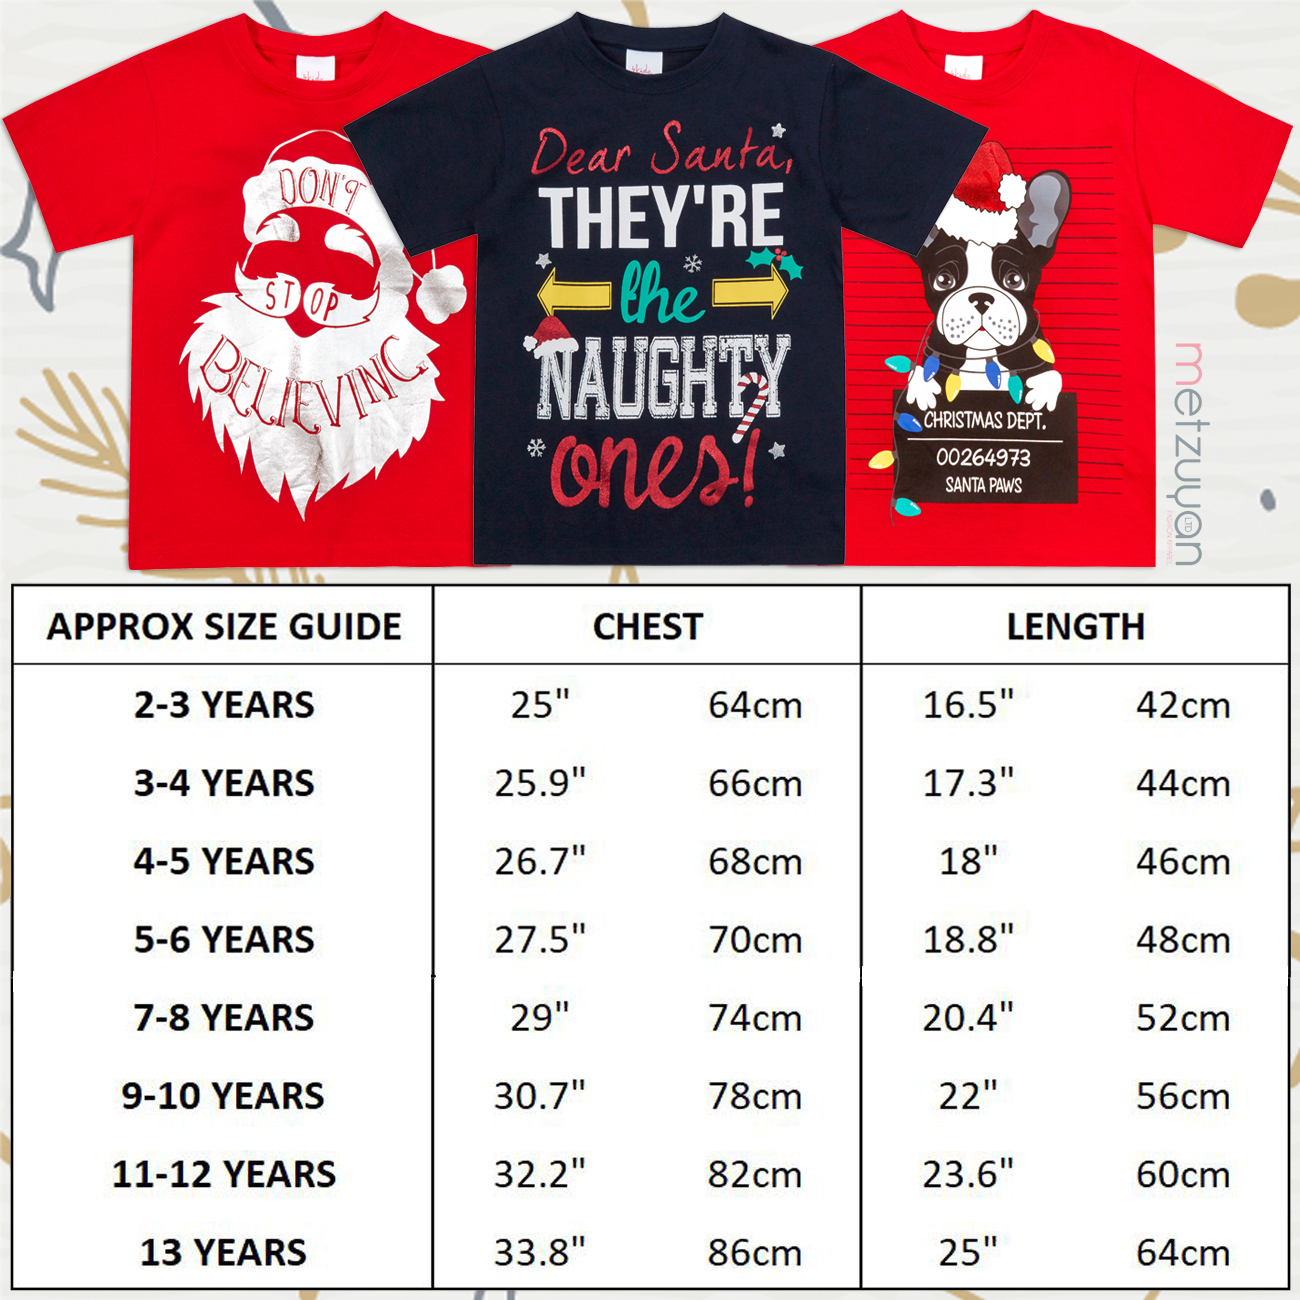 Childrens-Girls-Boys-Xmas-T-Shirts-Printed-Christmas-Design-100-Cotton-2-13-Yrs thumbnail 23